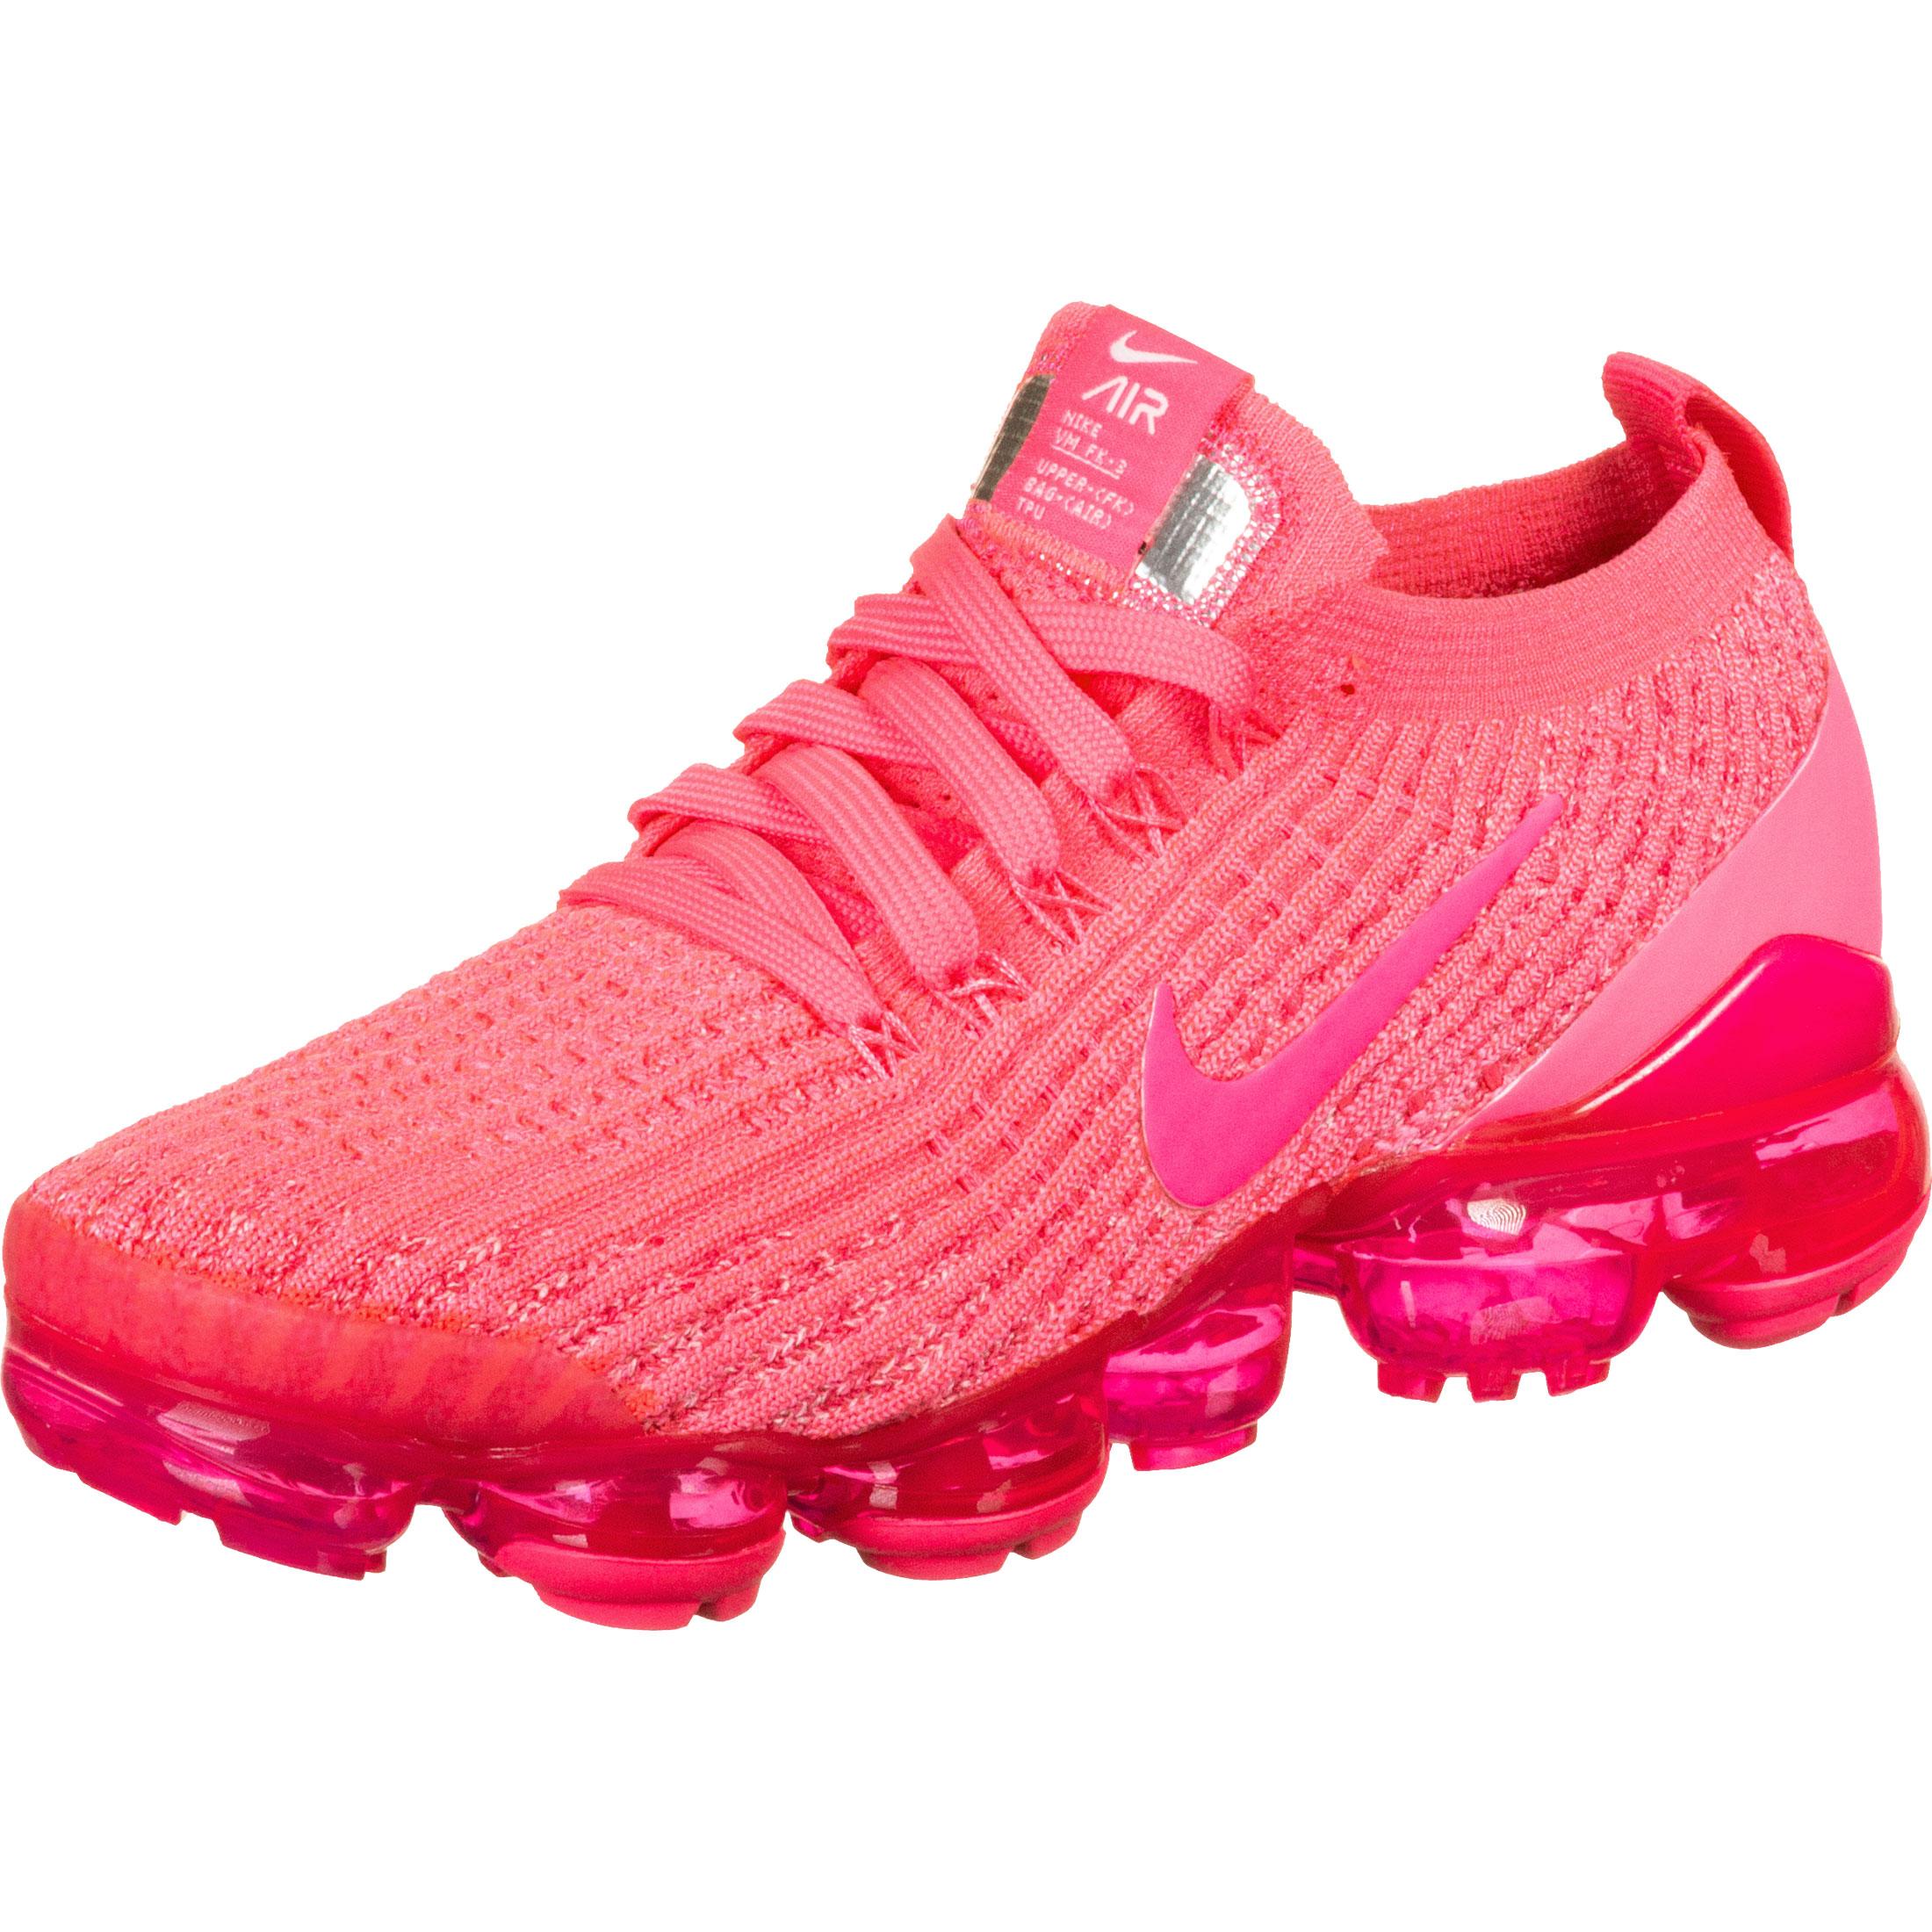 Nike Air Vapormax Flyknit 3 - Sneakers